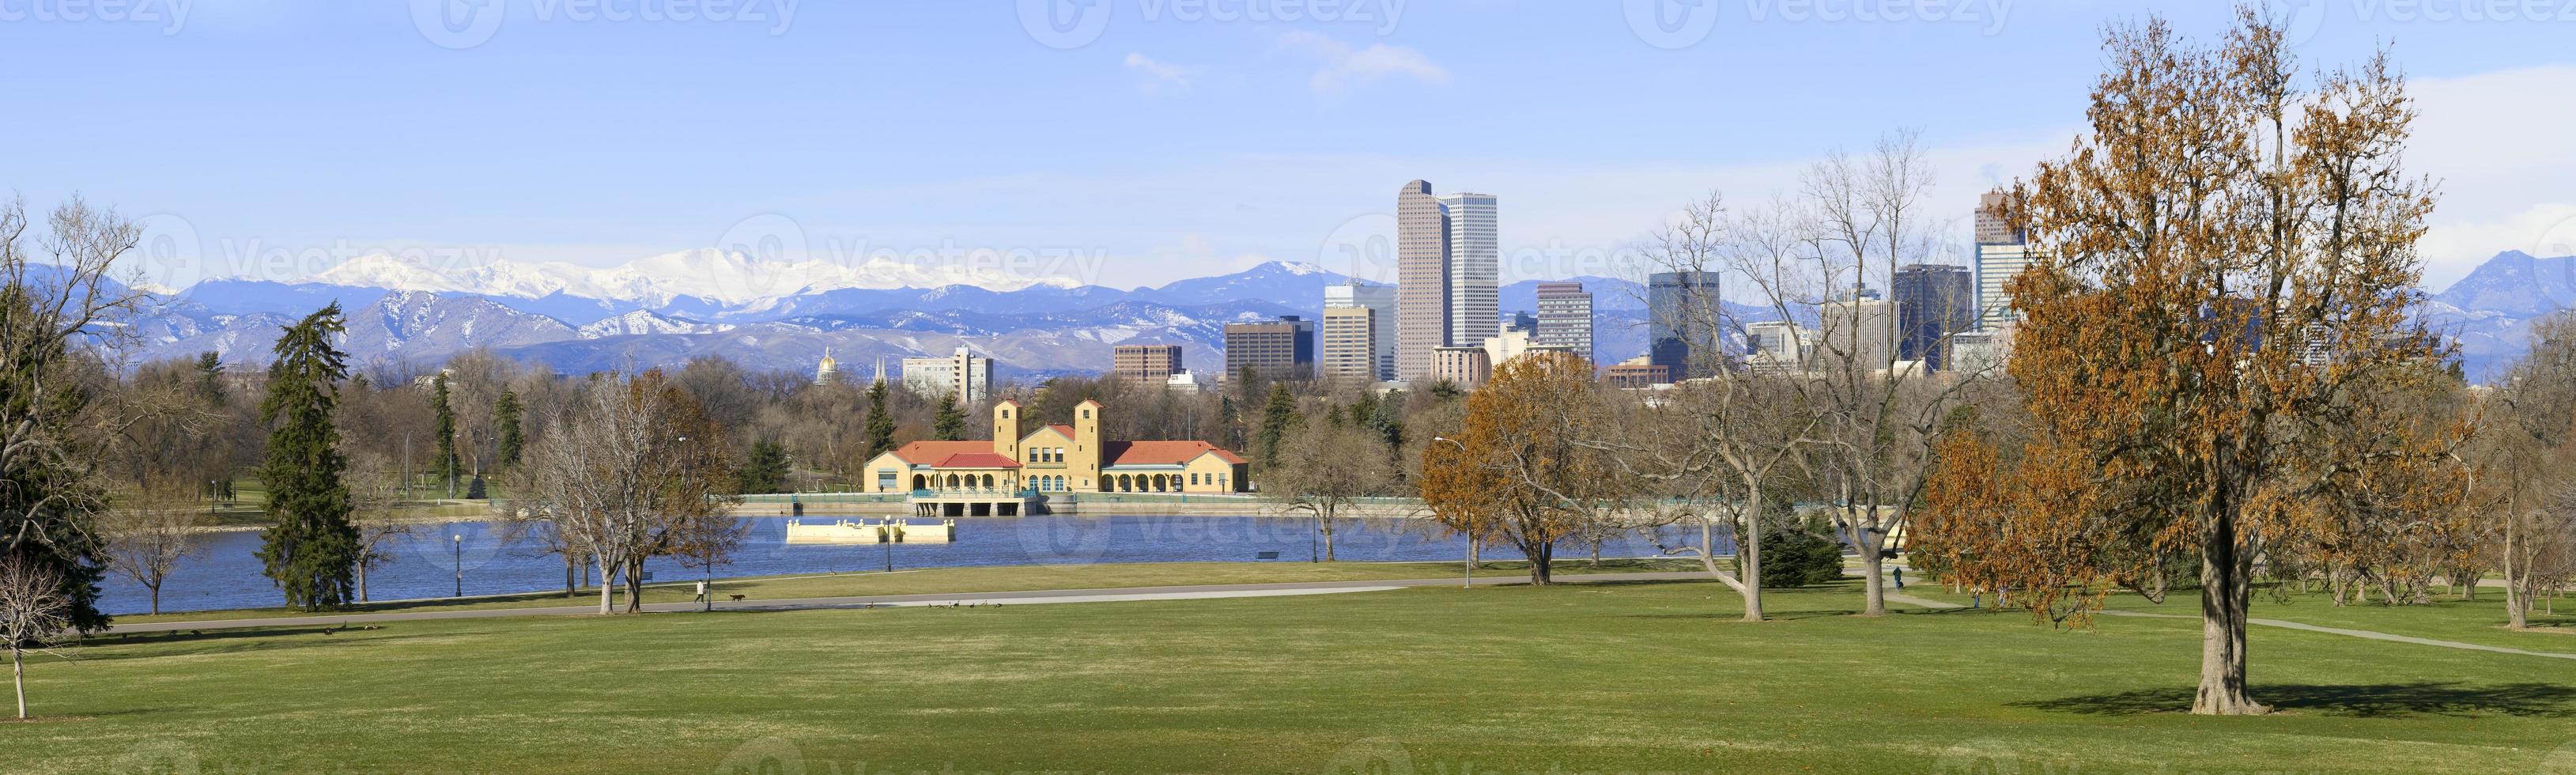 Panorama Denver Skyline April 2010 foto